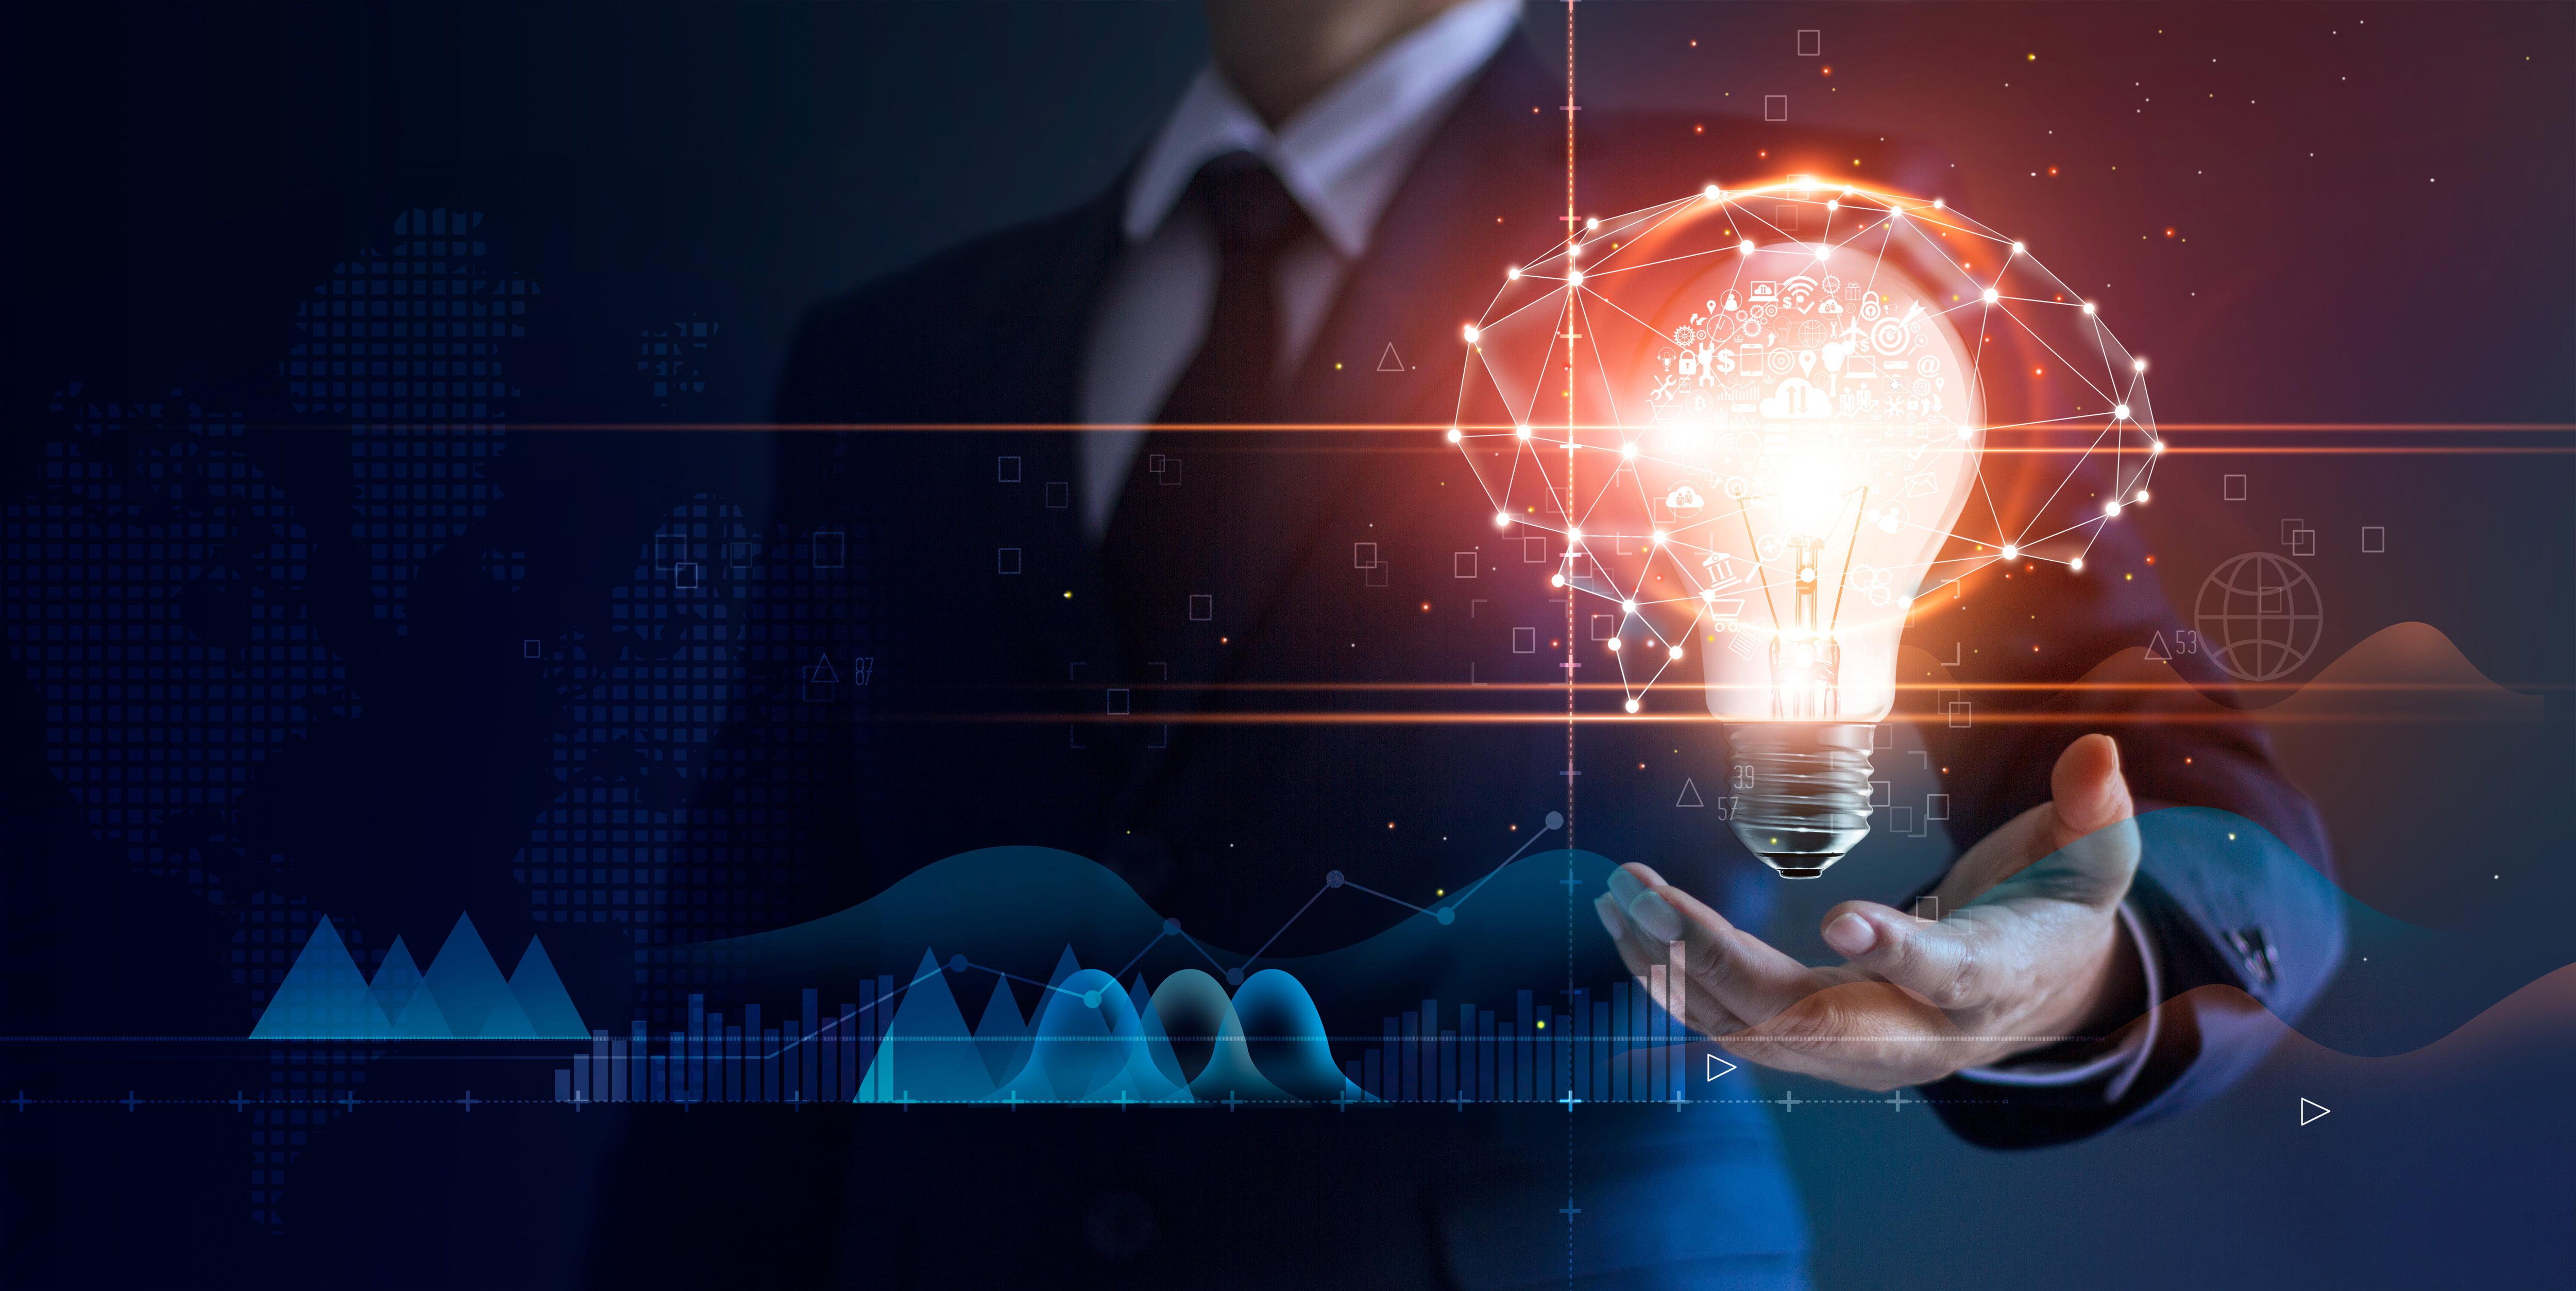 Rizing, LLC and Eightfold.ai®️ Announce Strategic Partnership to Deliver Comprehensive AI Talent Platform for SAP®️ SuccessFactors®️